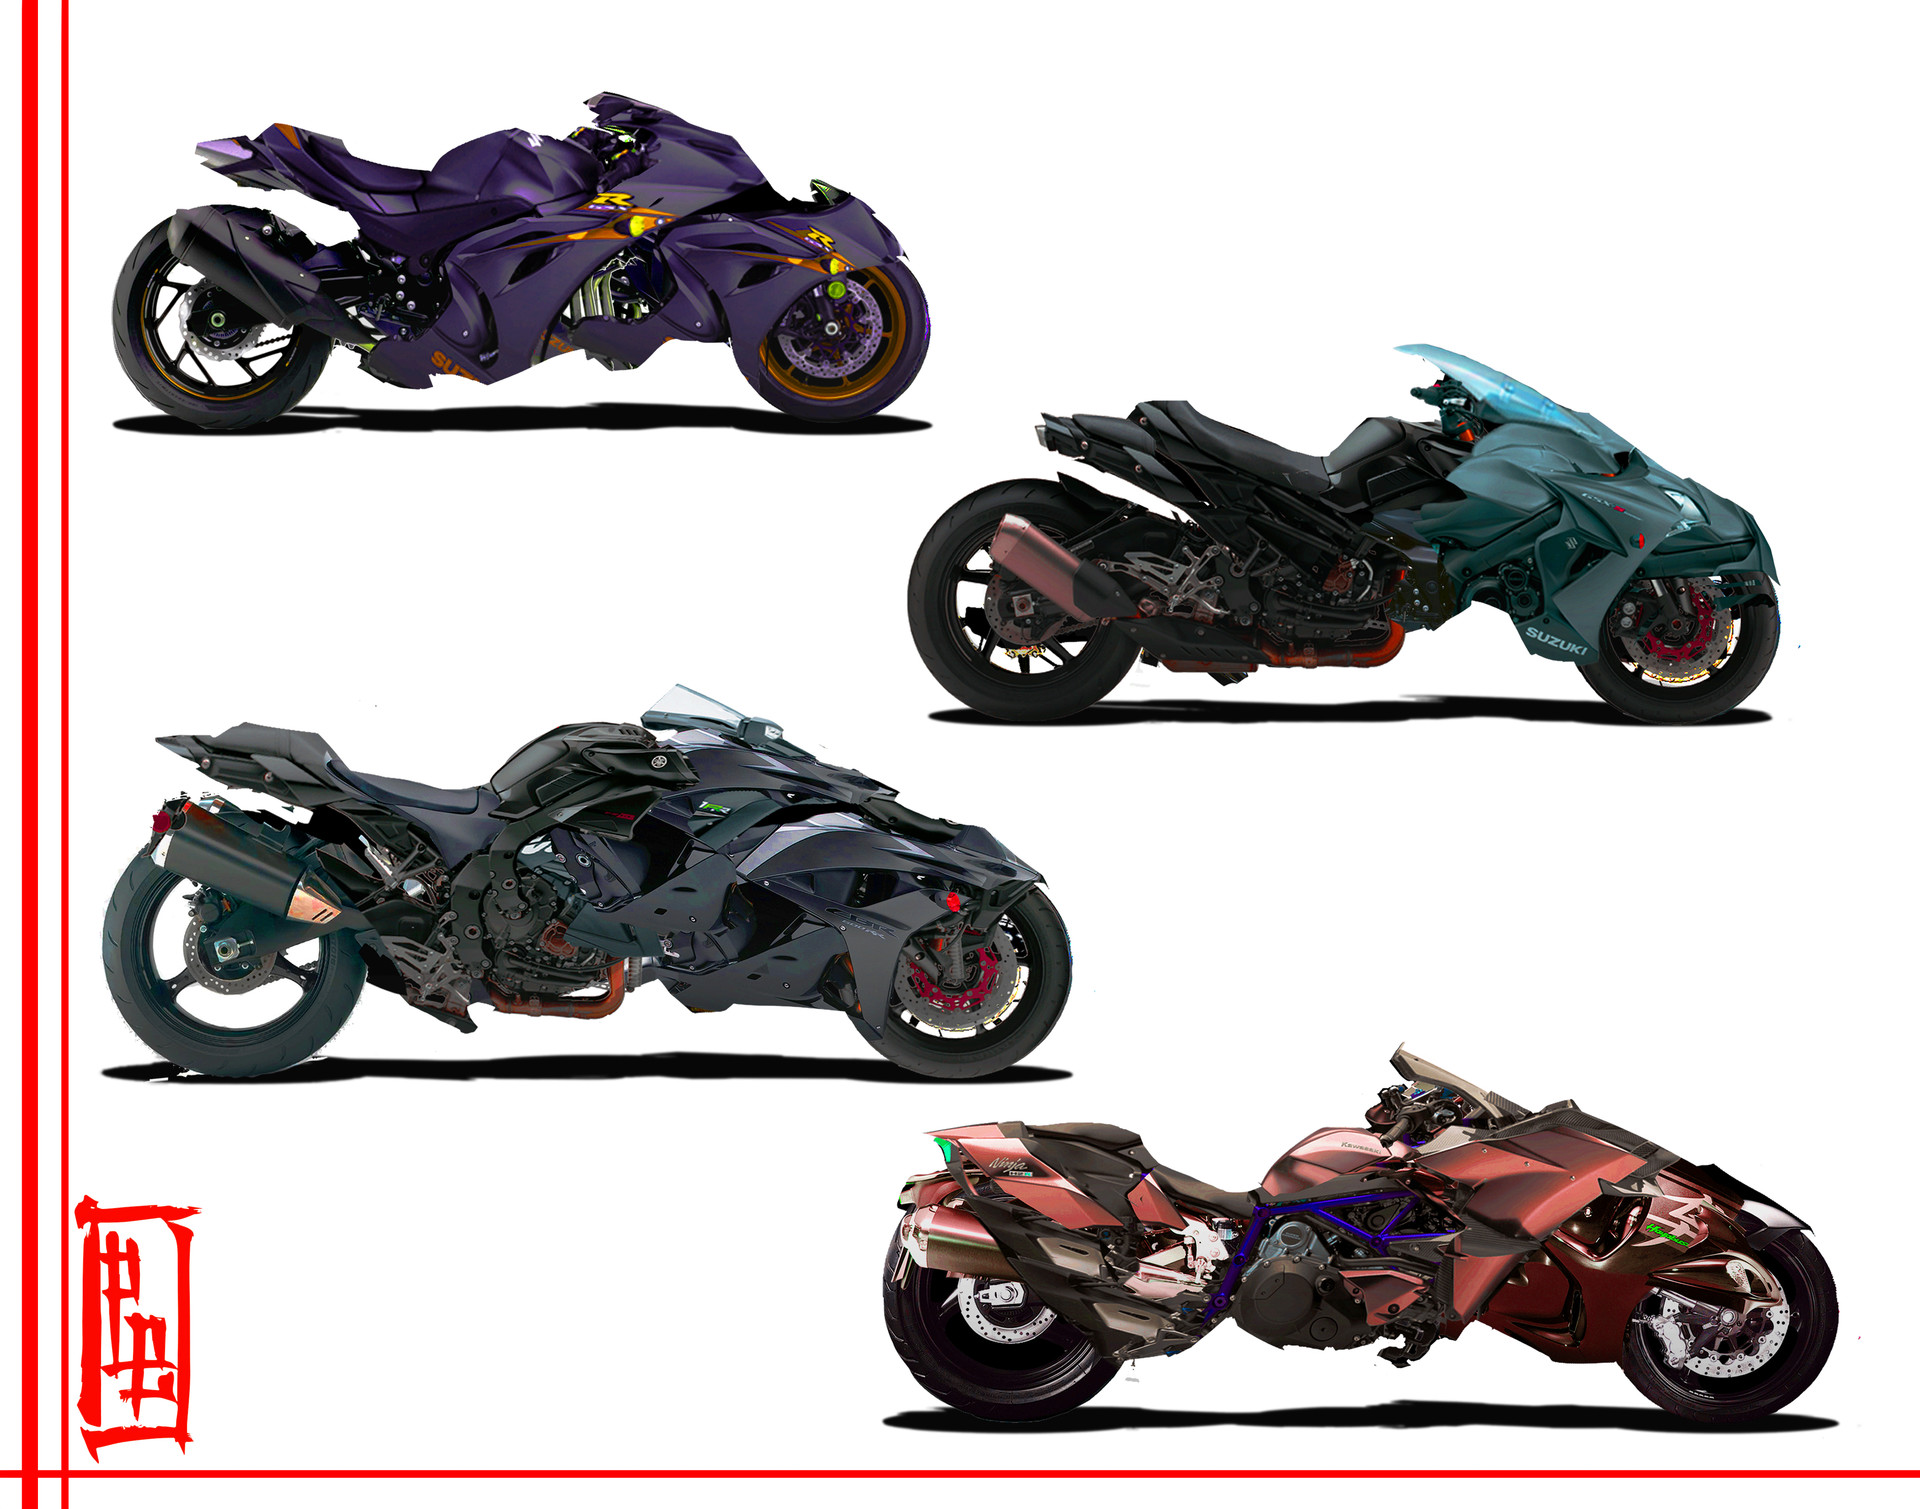 ArtStation - Cyberpunk Vehicle Designs, Patrick Barron